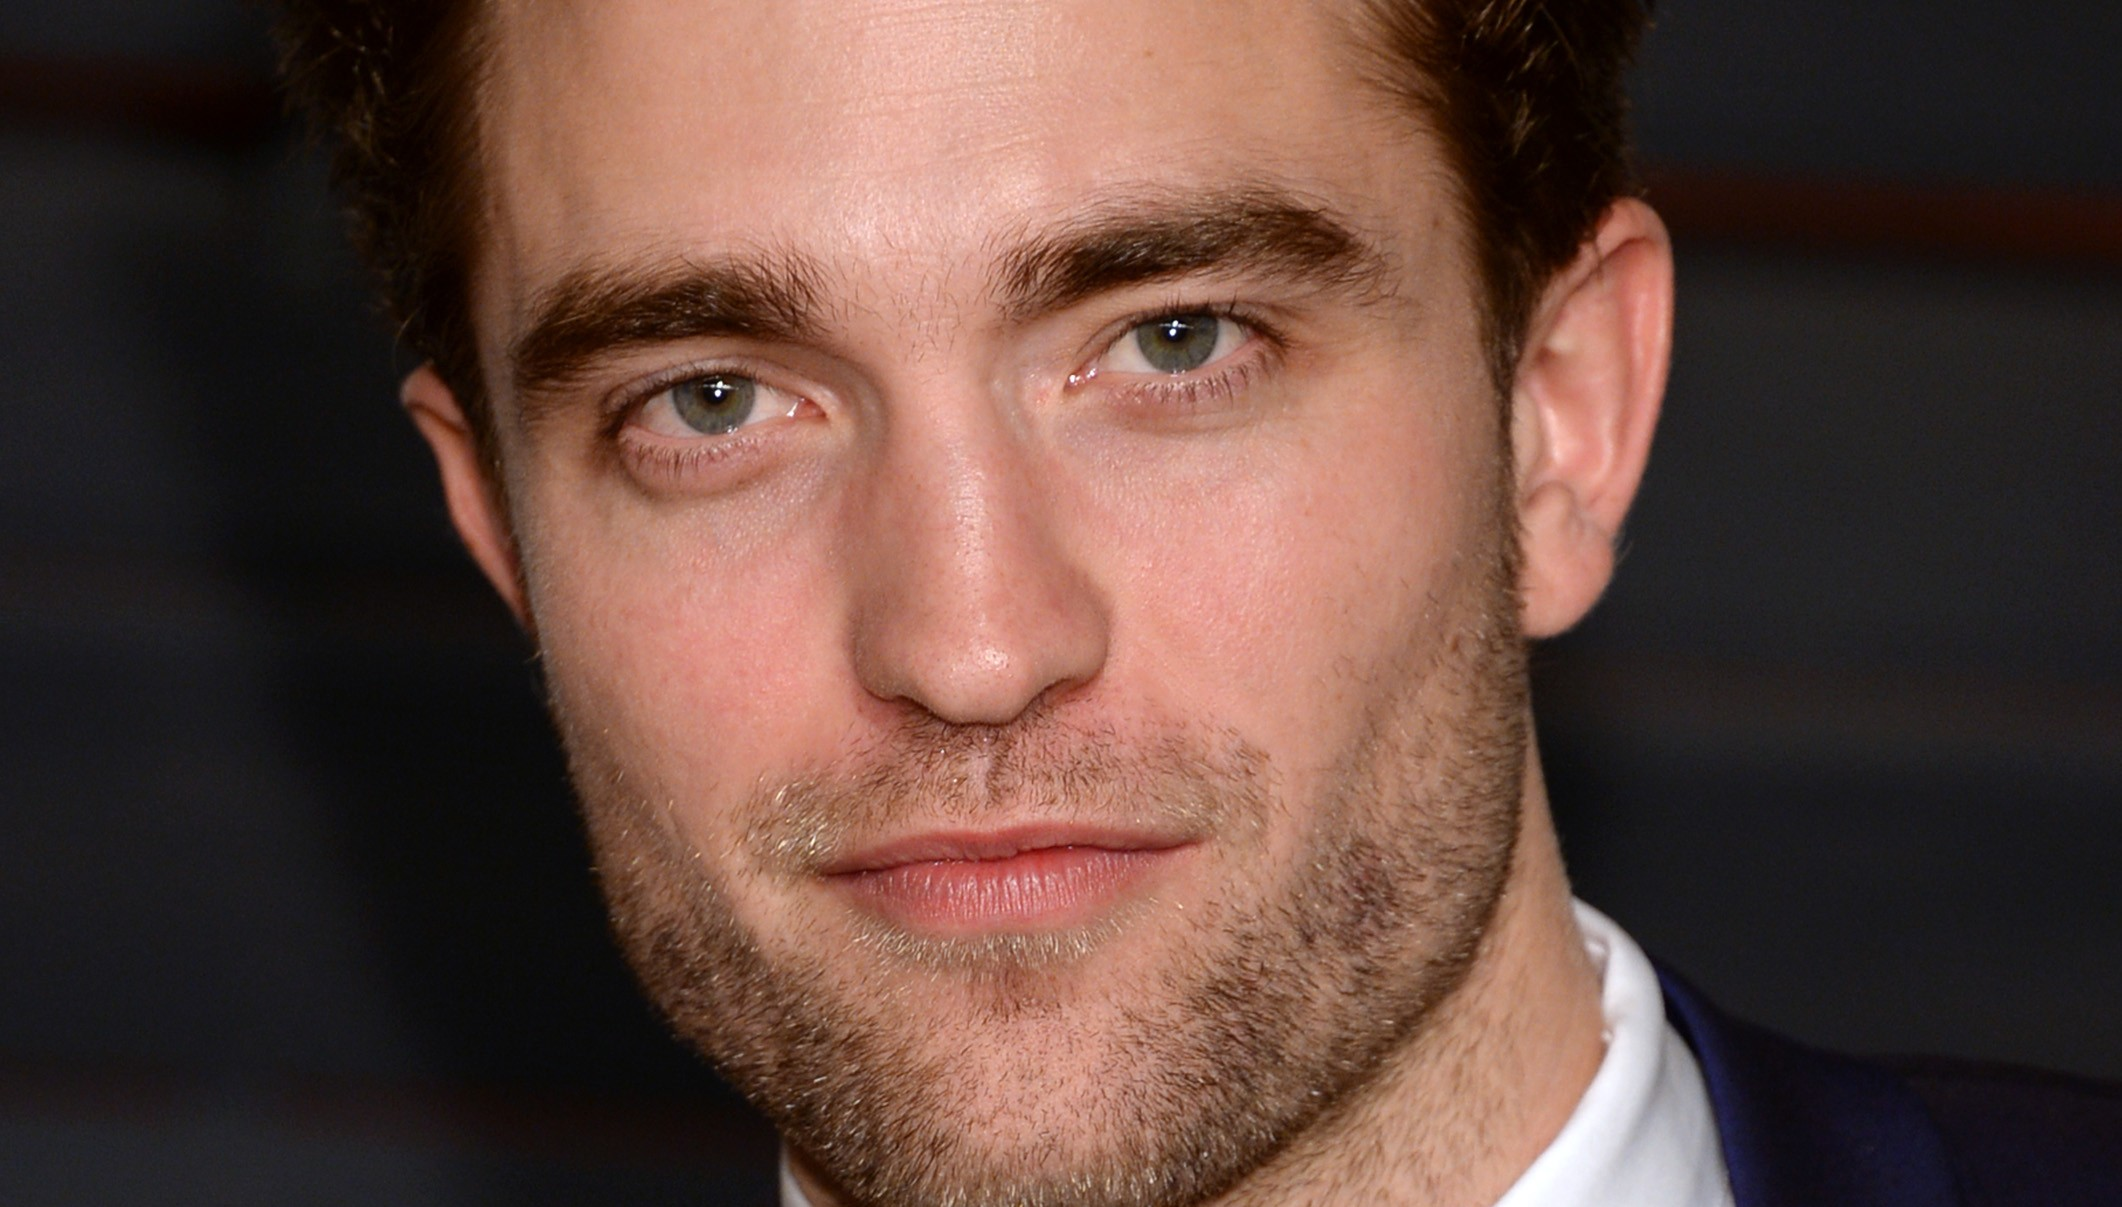 Robert fala sobre seus filmes e 50 Tons De Cinza em nova entrevista!